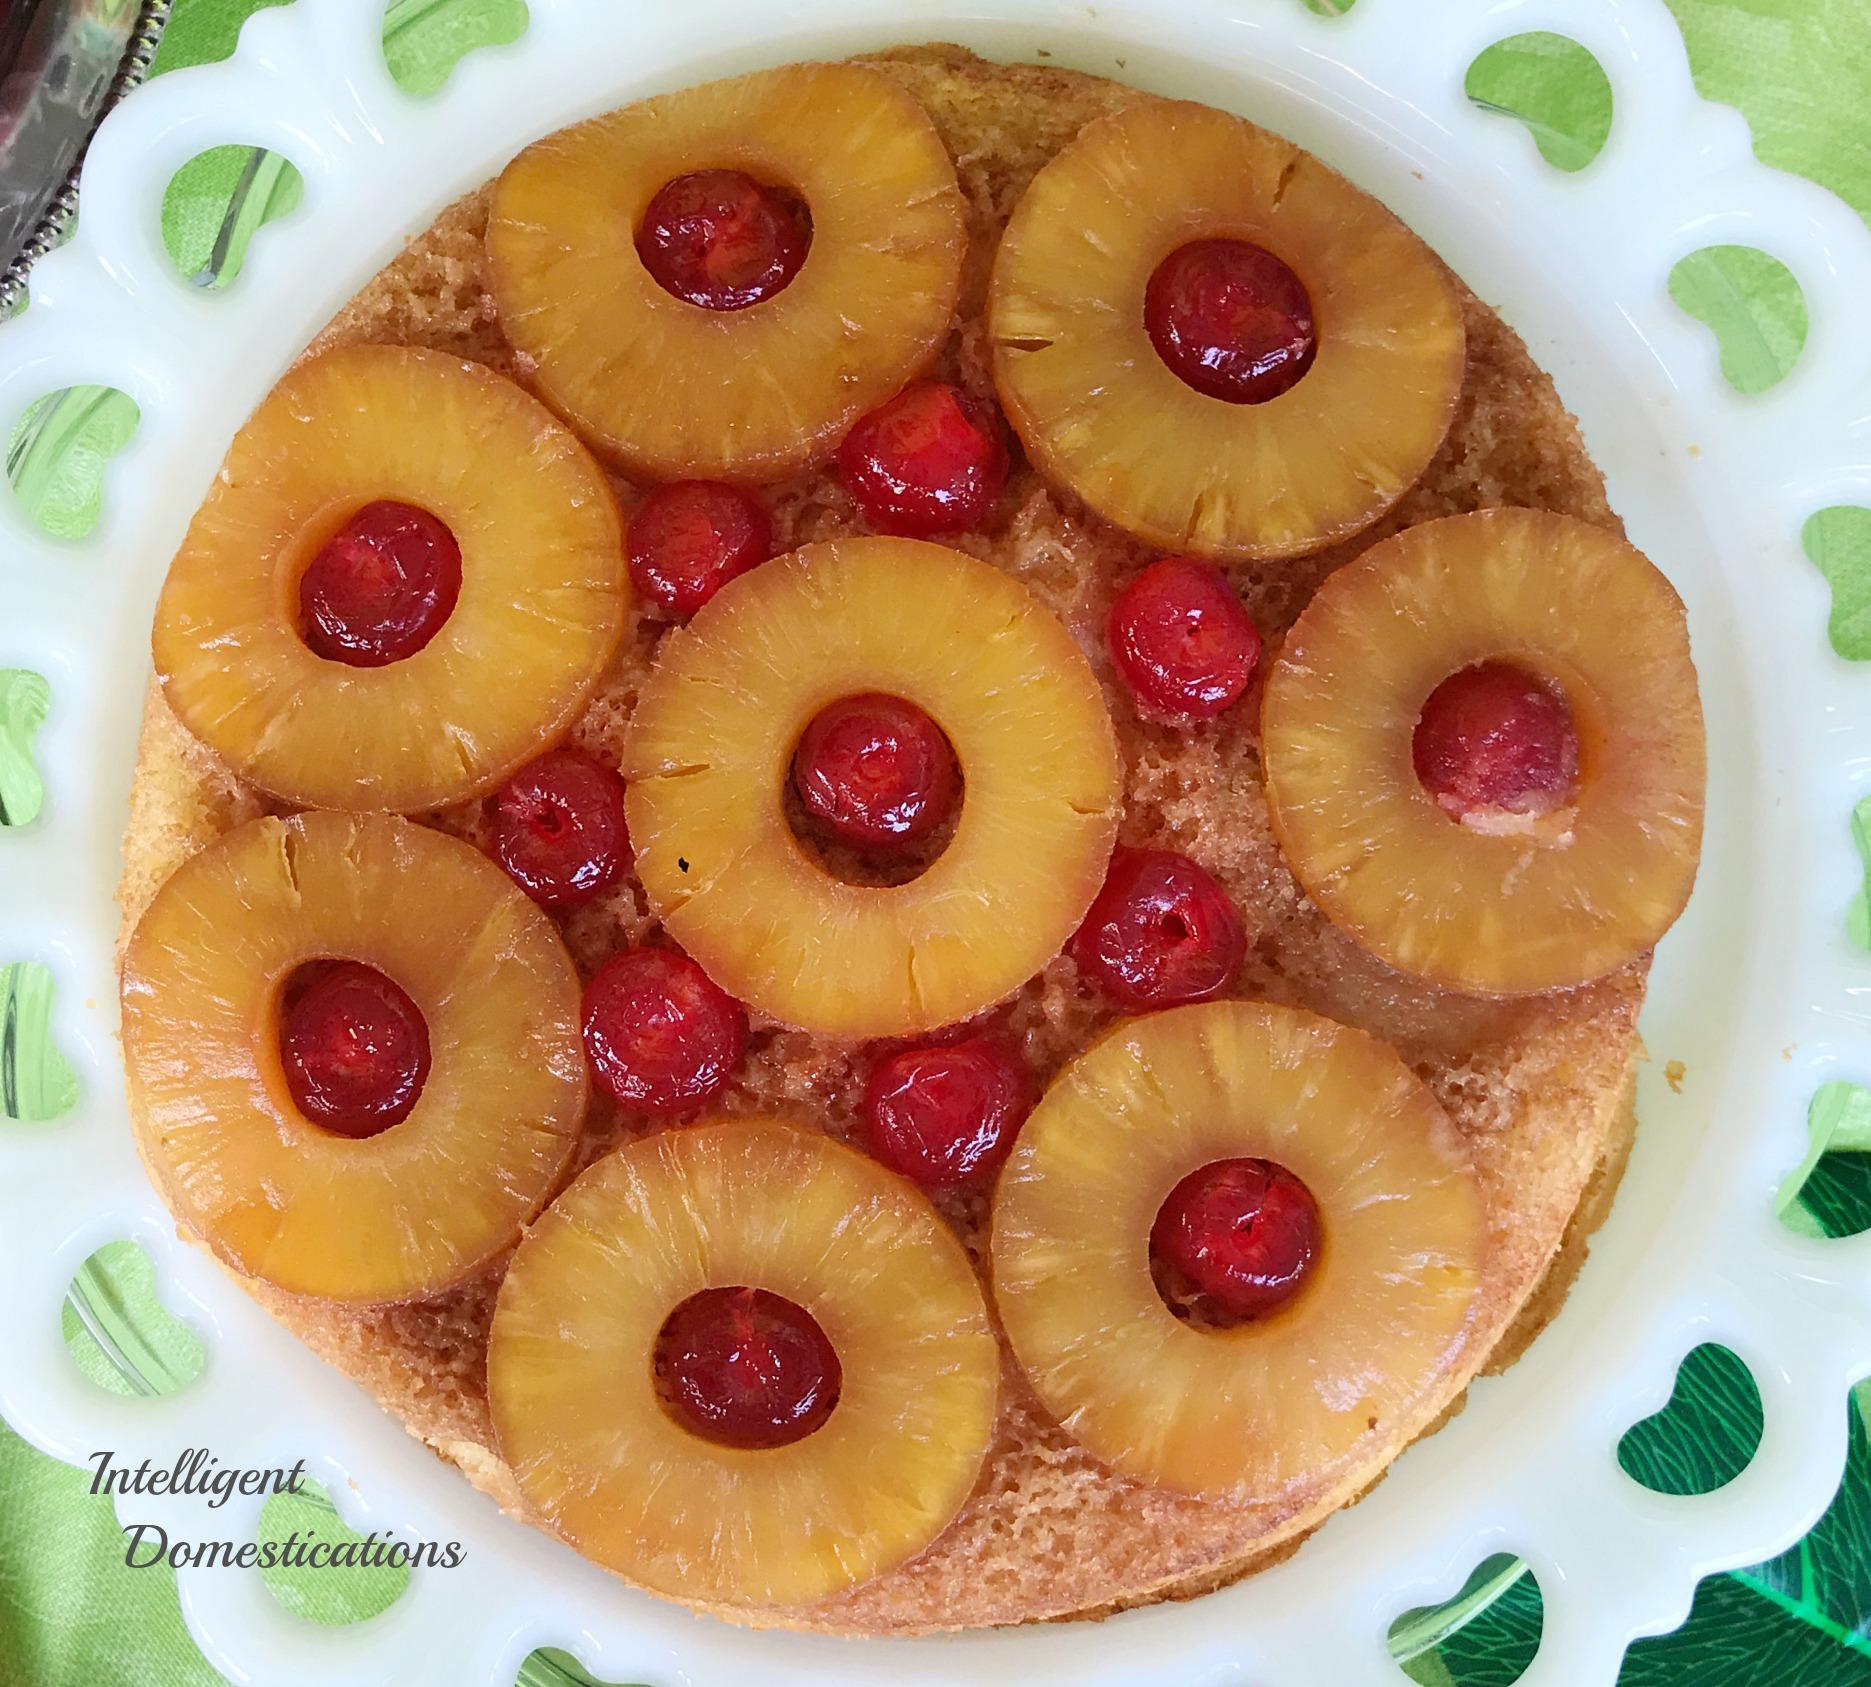 Pineapple Upside Cake From Scratch: Easy Pineapple Upside Down Cake Recipe